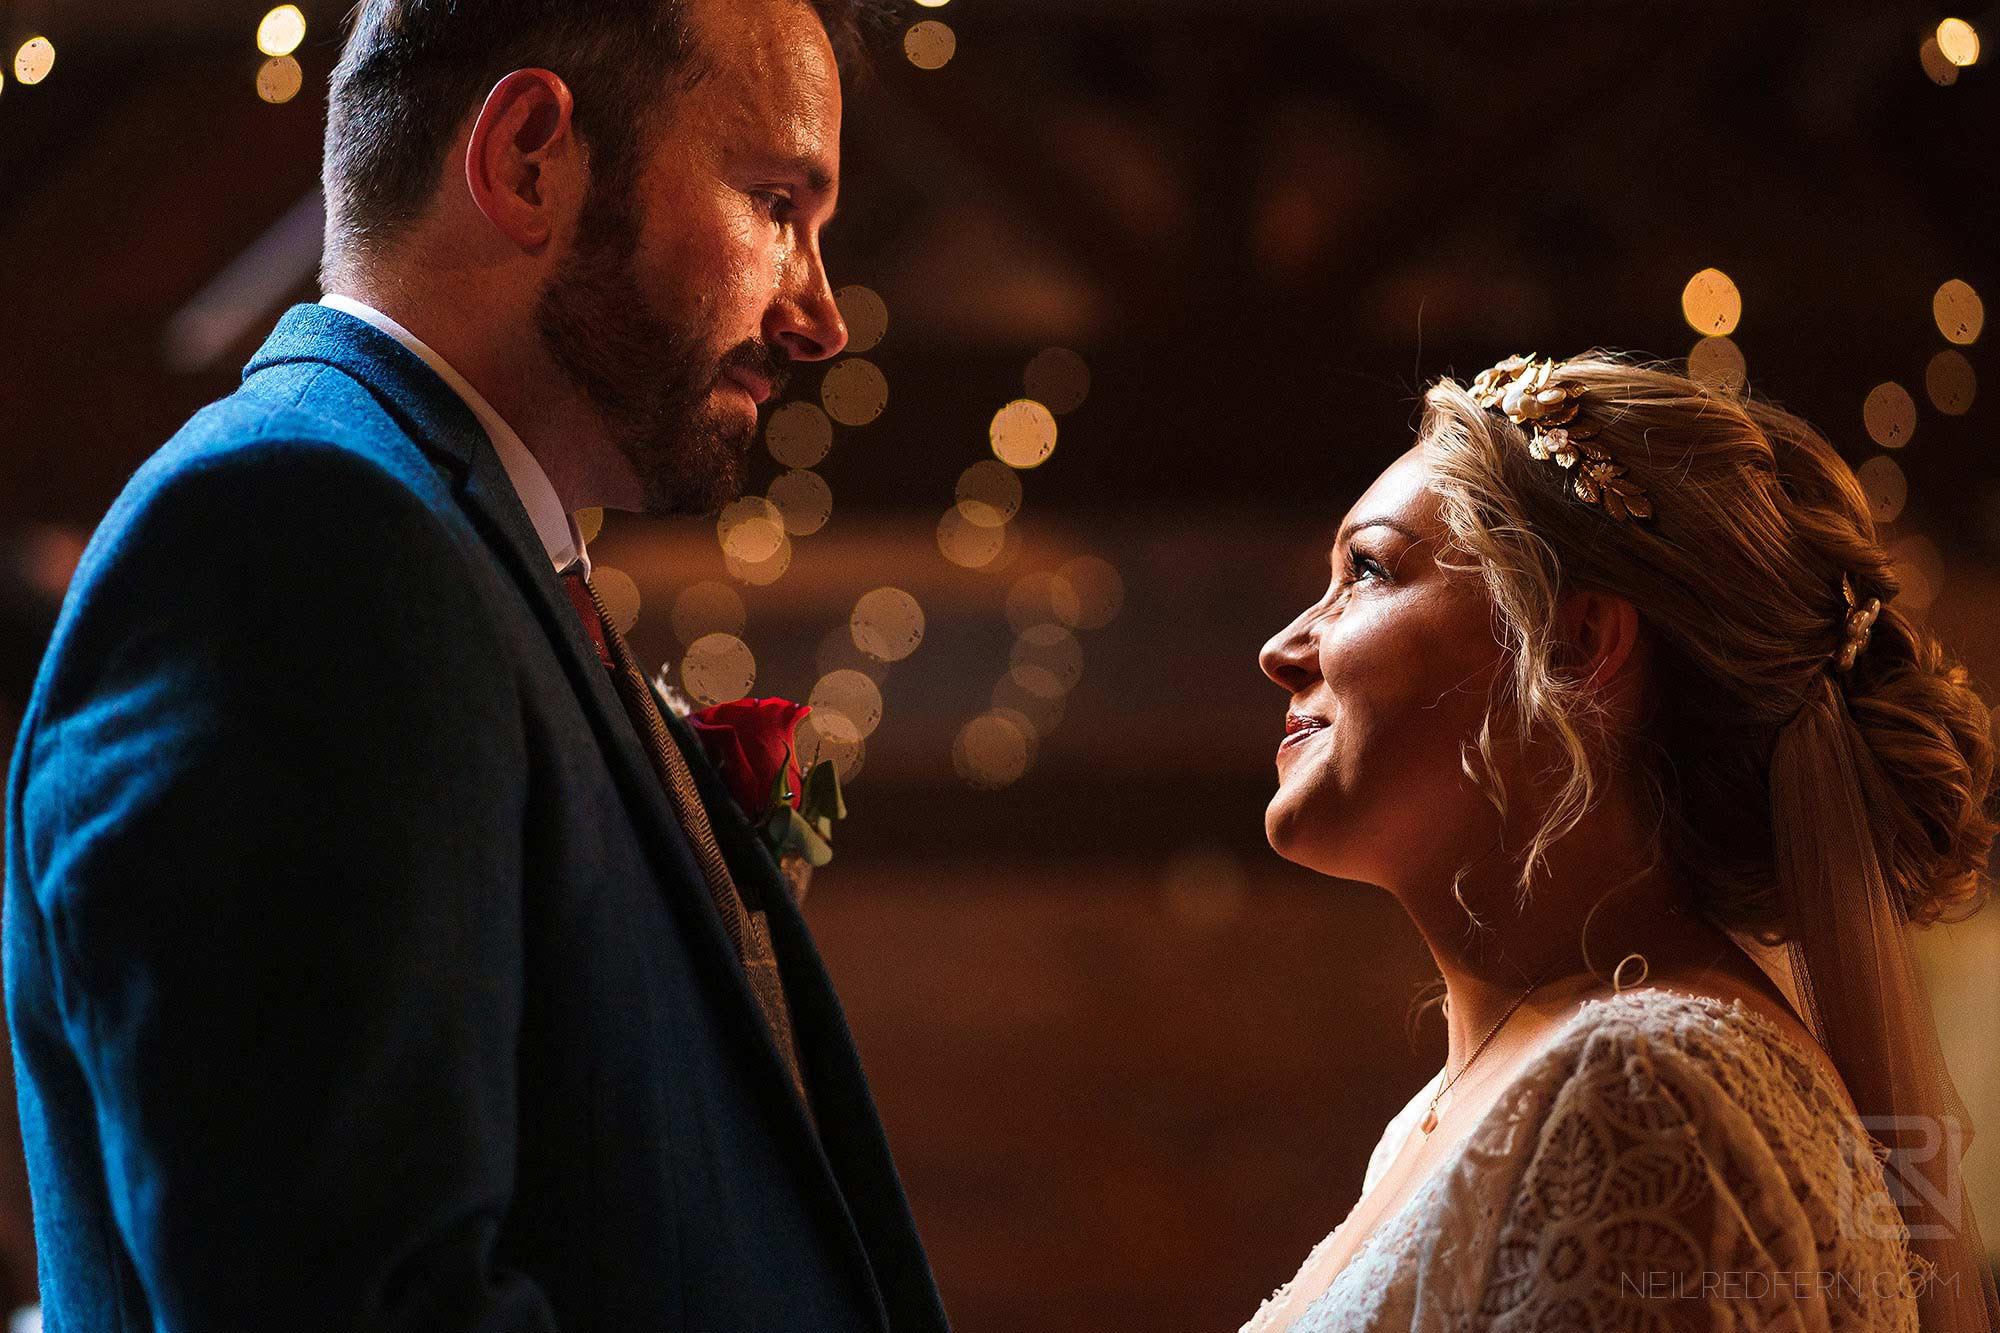 heartfelt look between bride and groom during Abbeywood Estate wedding ceremony